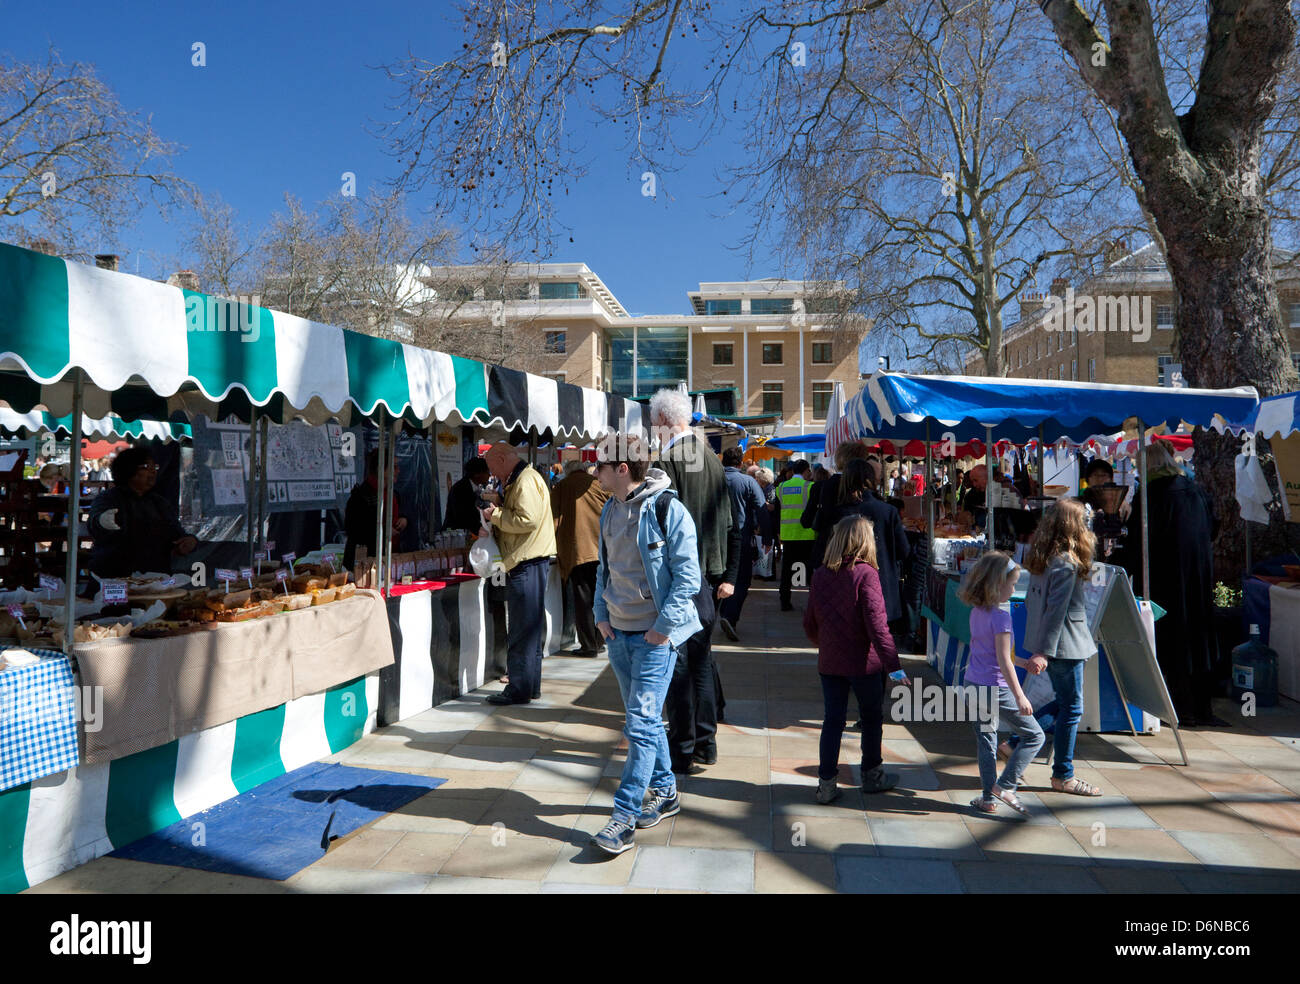 Partridges food market, Duke of York Square, King's Road, Chelsea, London - Stock Image